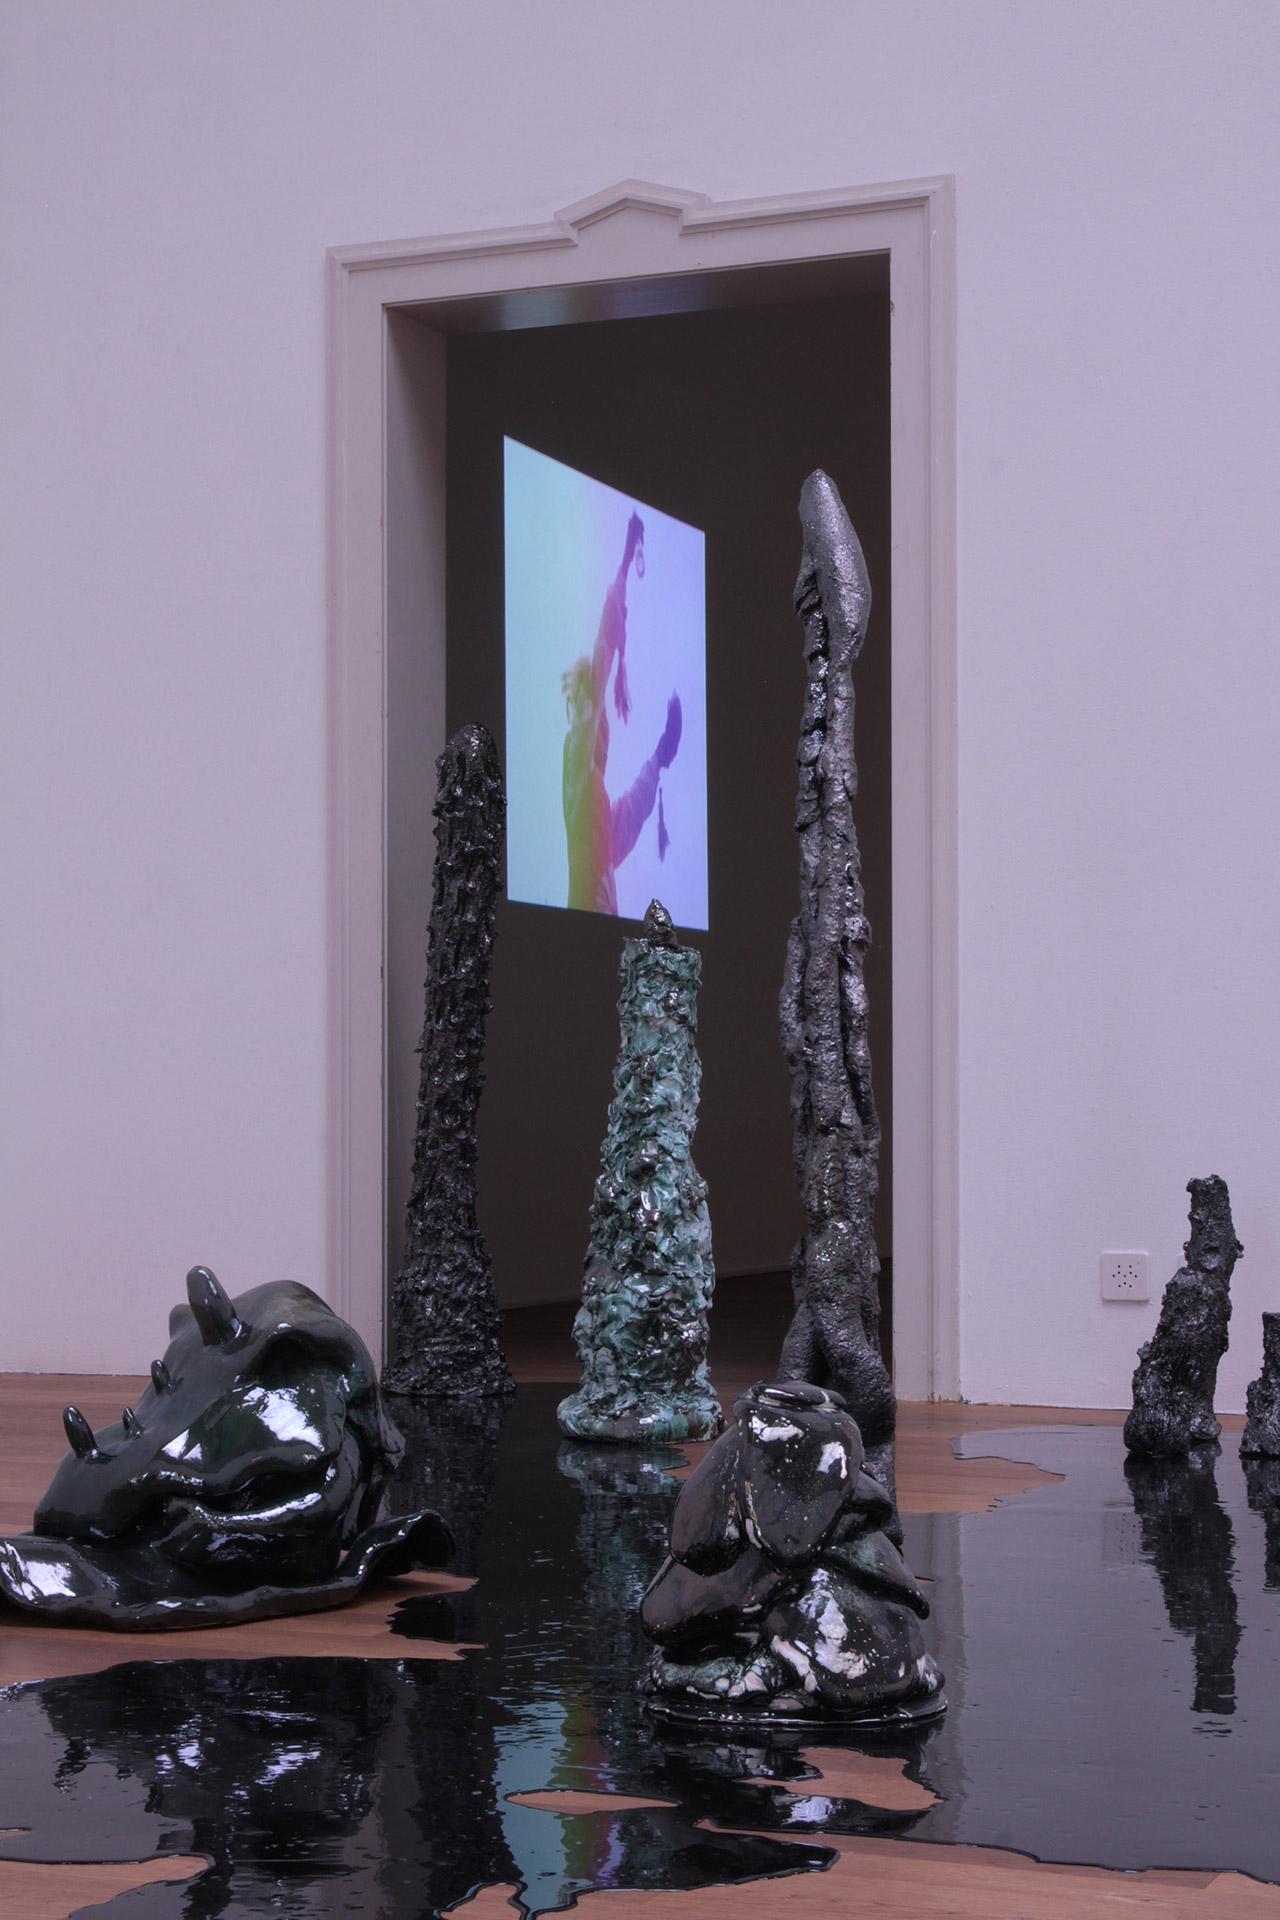 Kunsthalle-Winterthur-Salvatore-Arancio-5.jpg